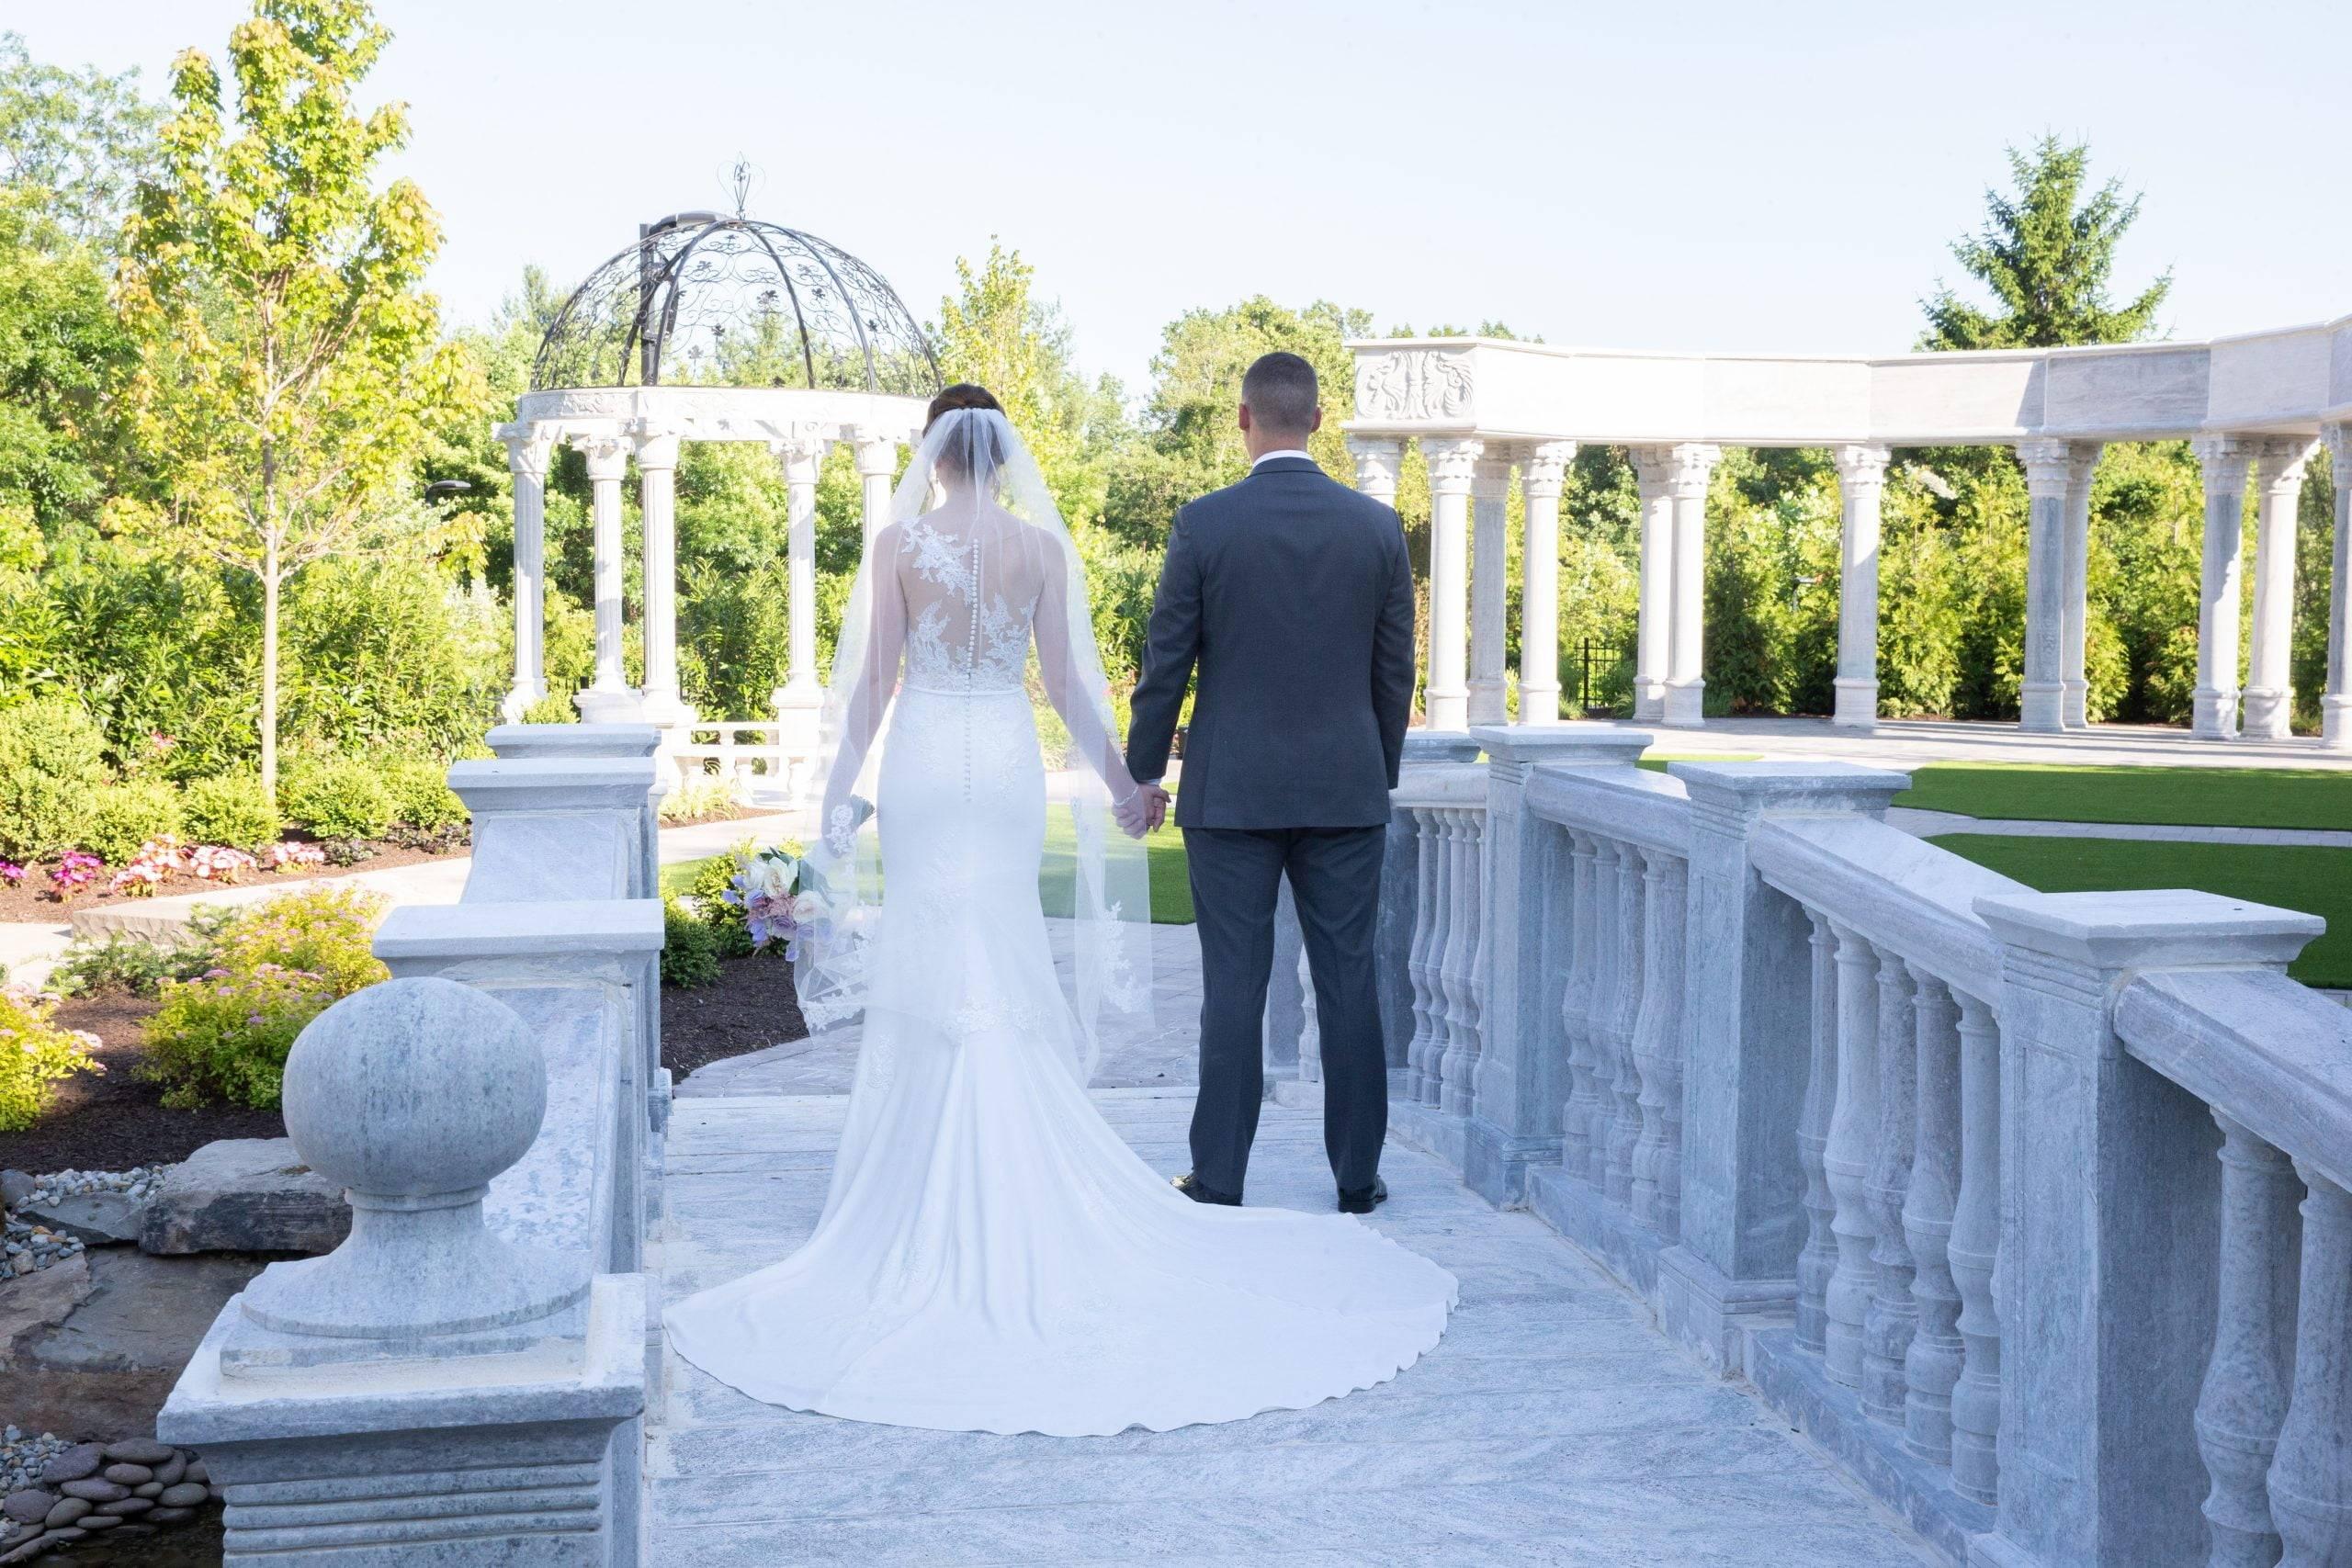 Meadow Wood bride and groom walking on outdoor patio